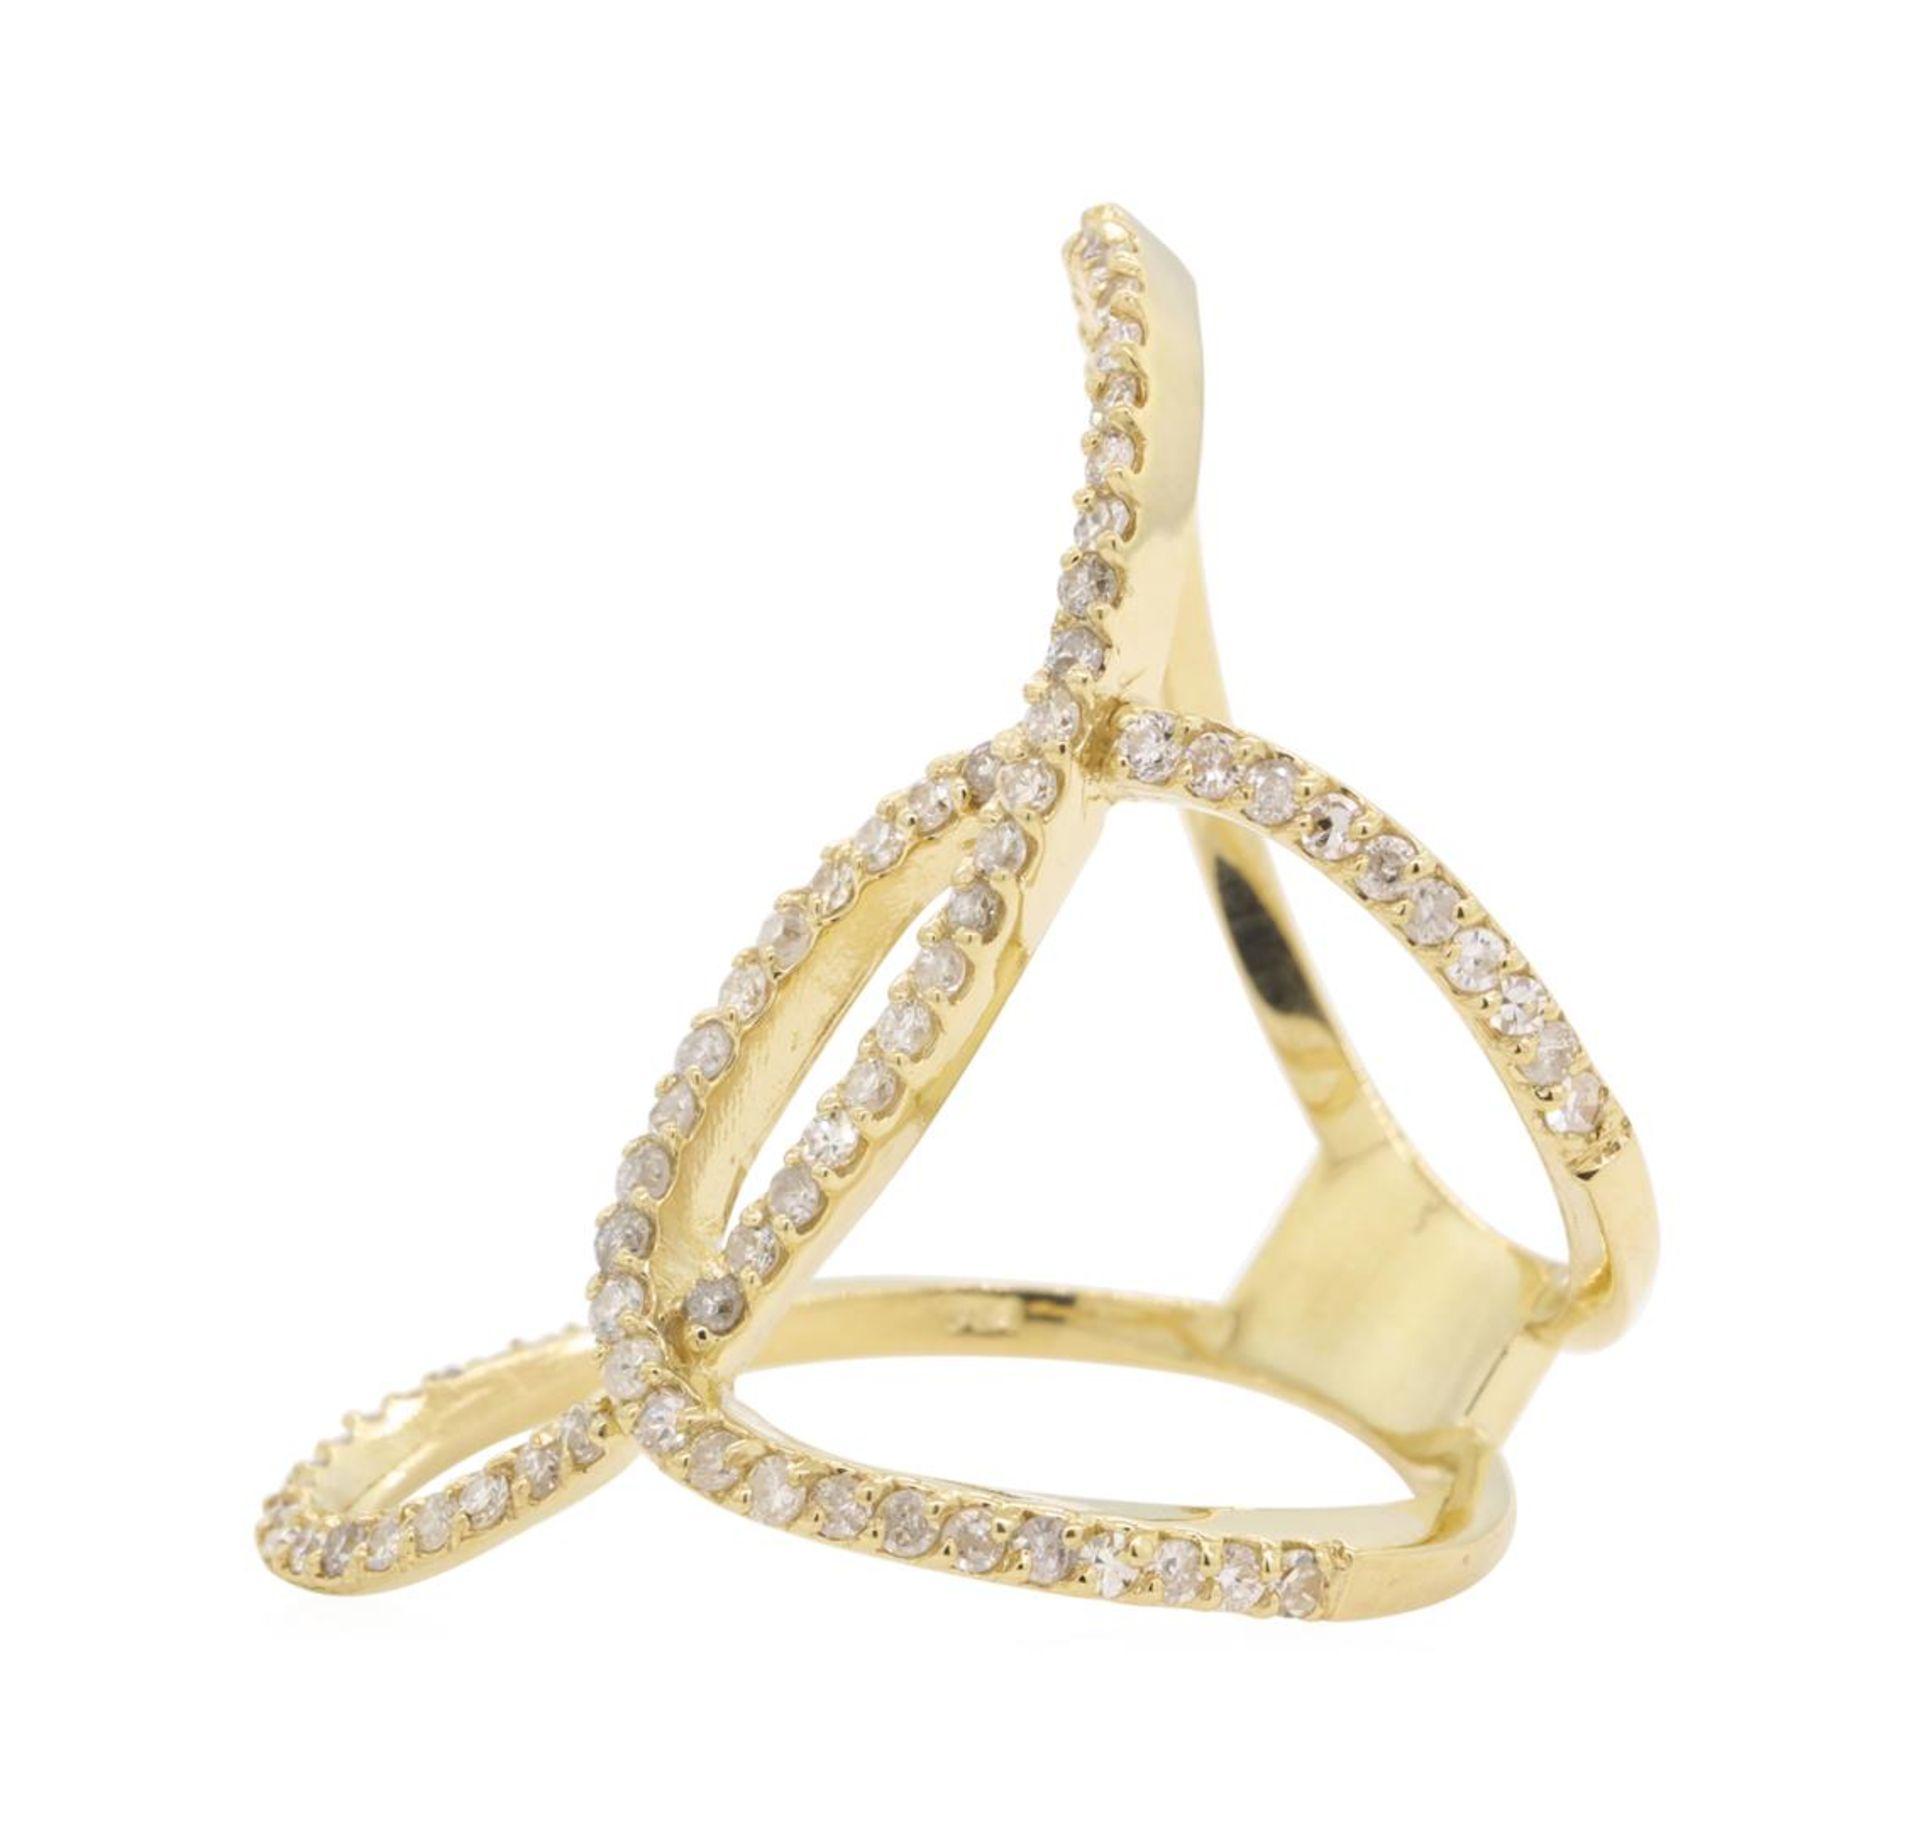 0.75 ctw Diamond Ring - 14KT Yellow Gold - Image 2 of 5